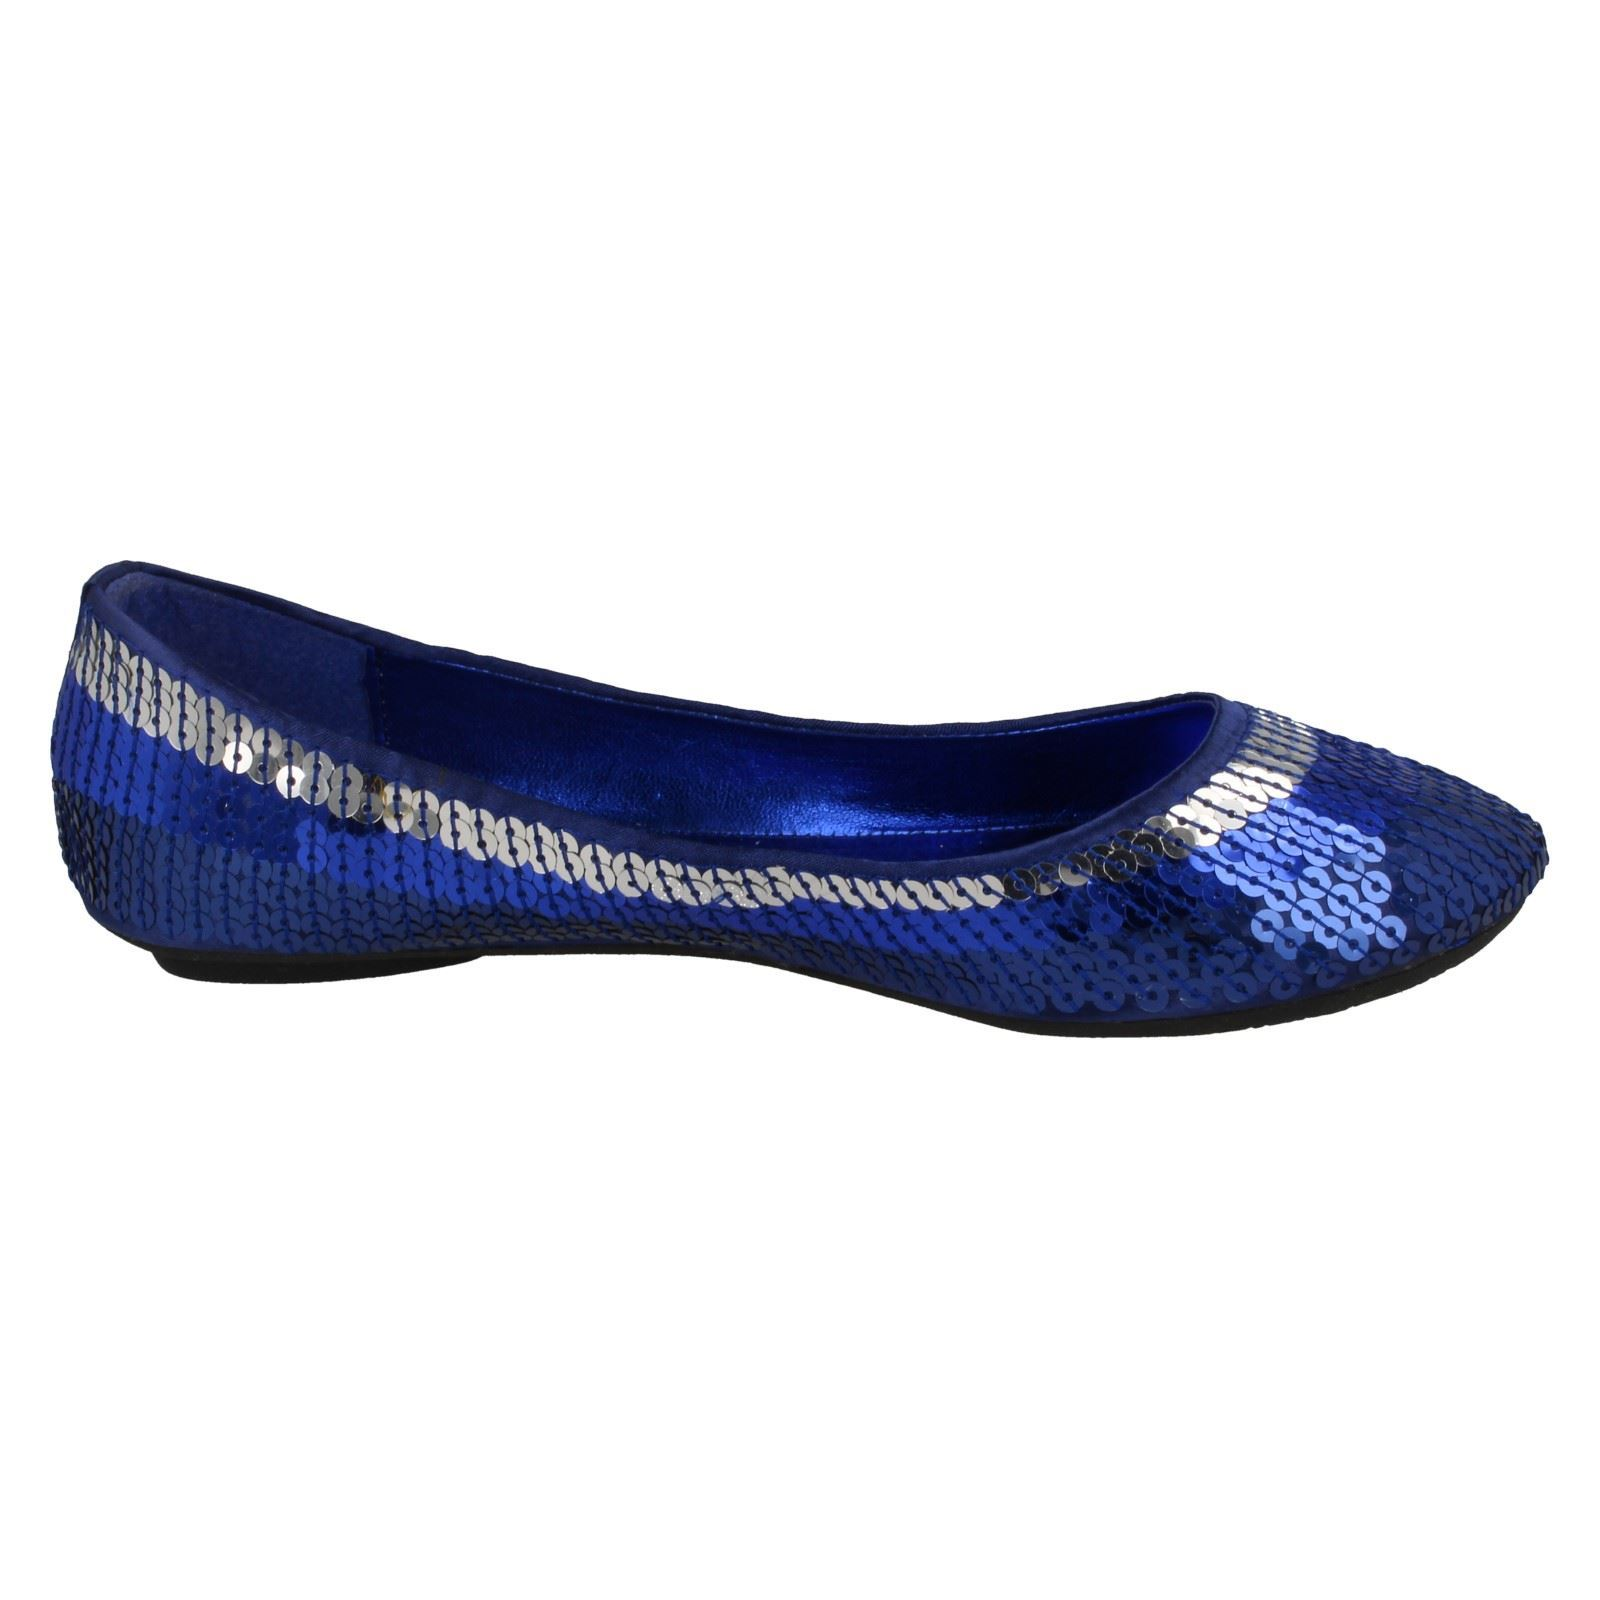 Girls Cutie Flat Slip On Sequin Ballerina /'Shoes/'